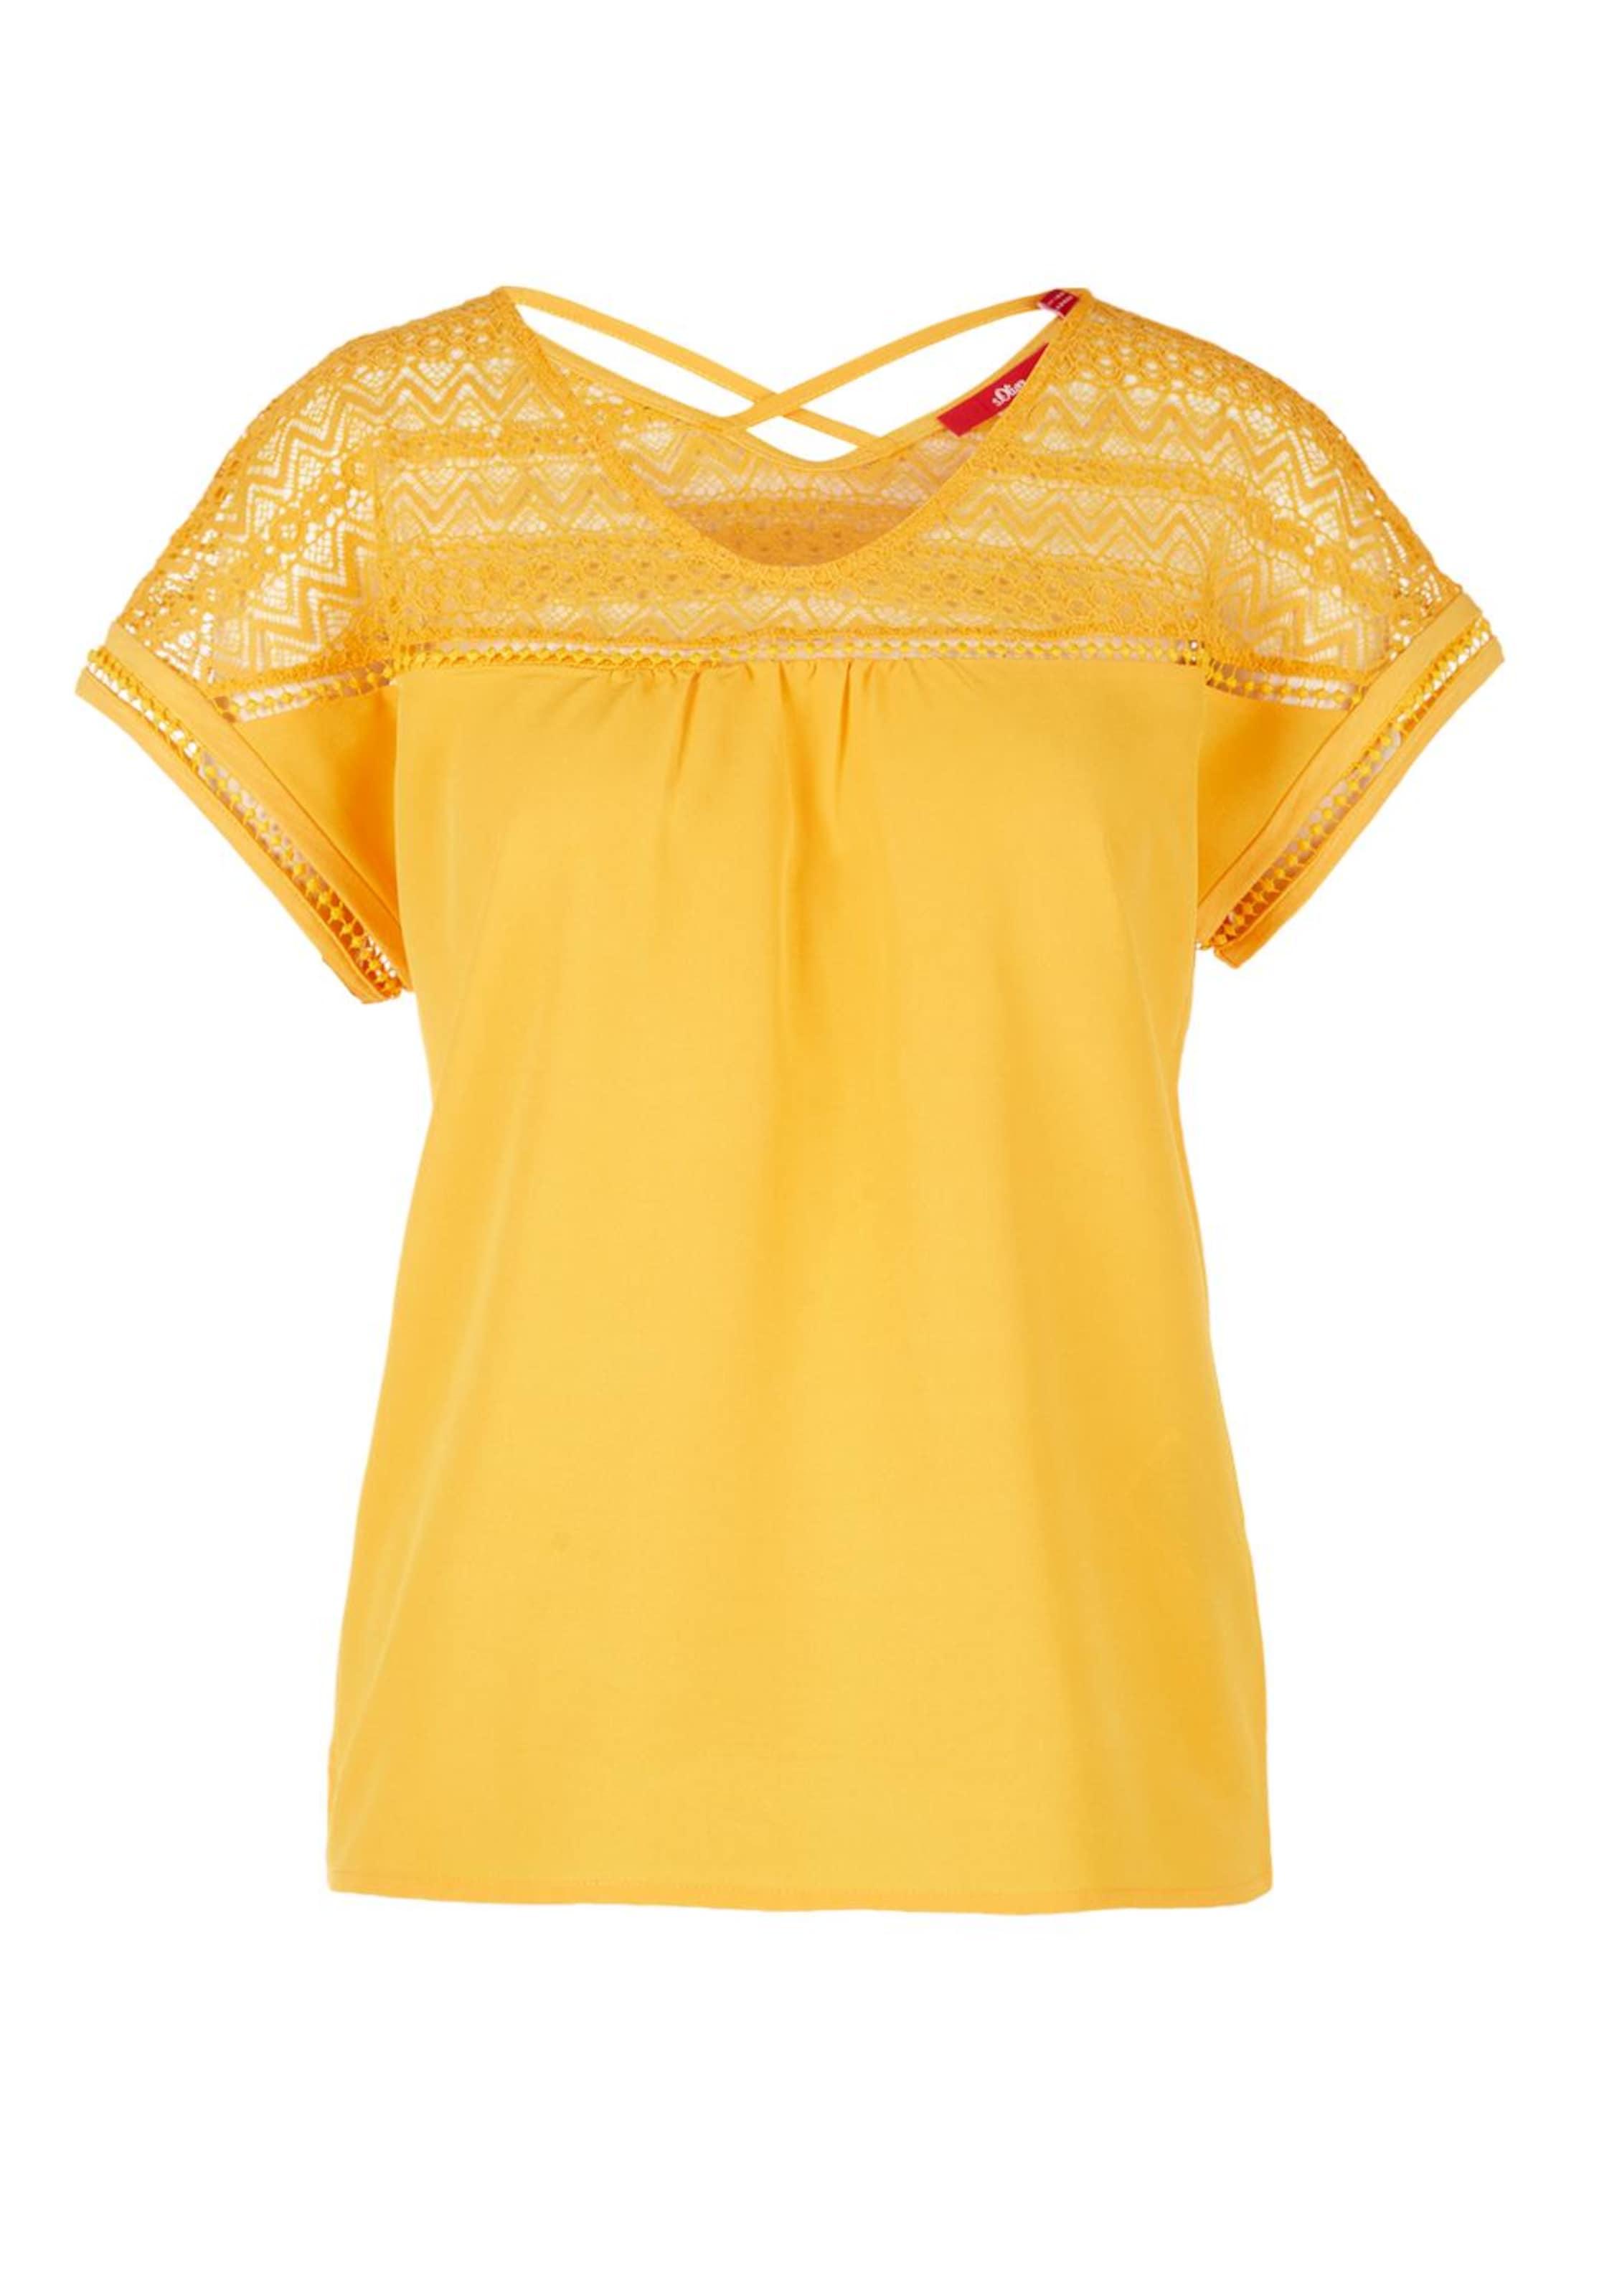 oliver Label S Gelb In Red Blusenshirt m8Nn0w